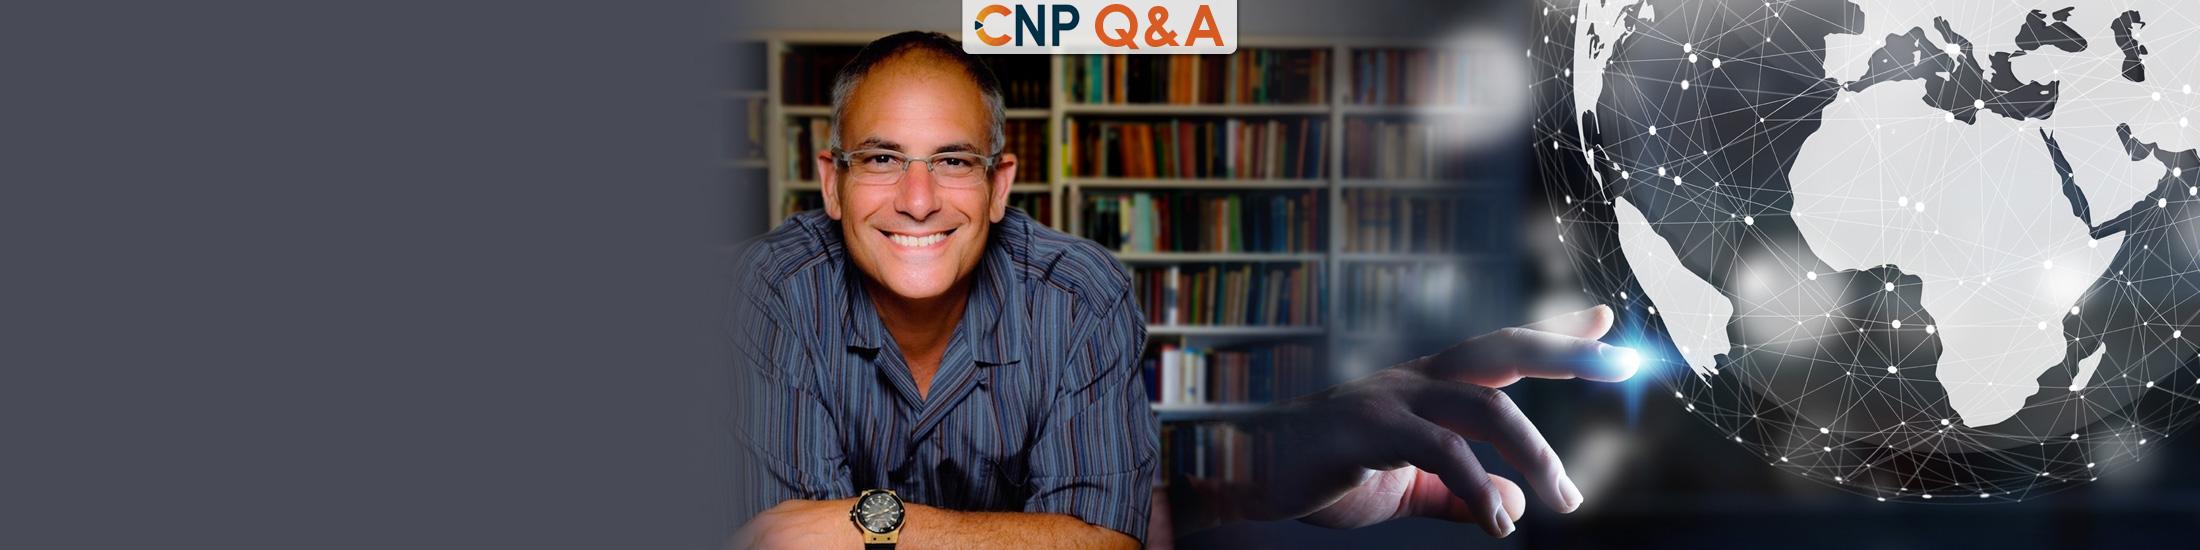 'Local, Local, Local': Q&A with BlueSnap's Ralph Dangelmaier